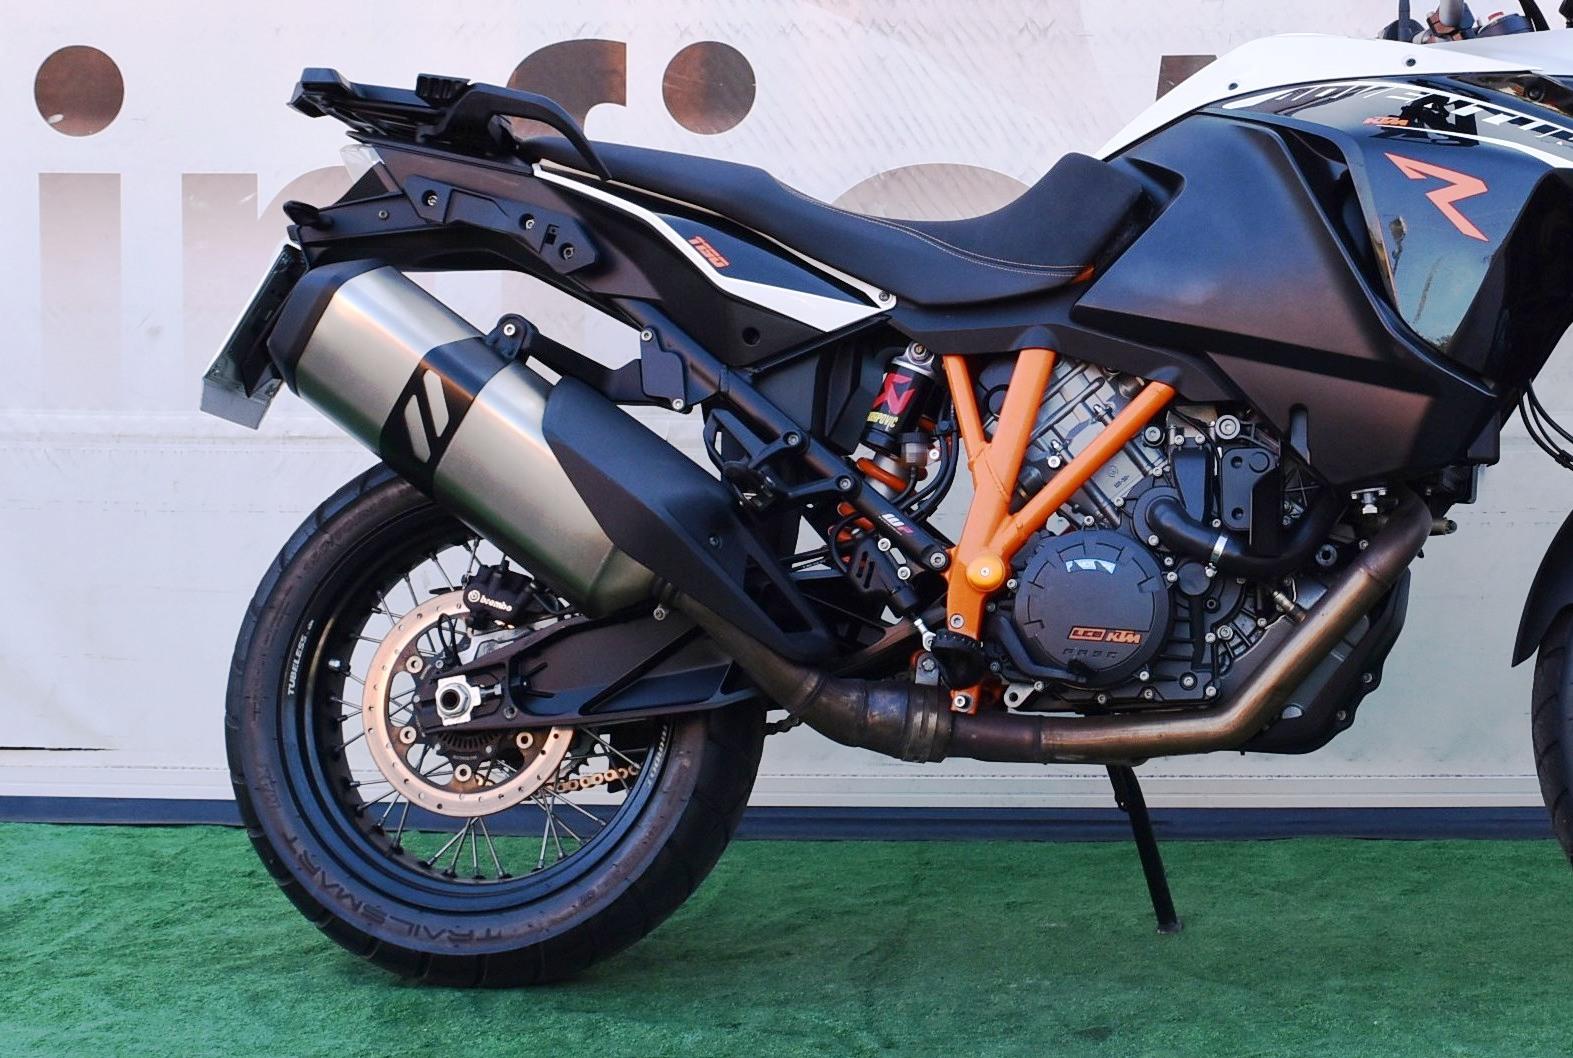 KTM 1190 ADVENTURE R – 2016